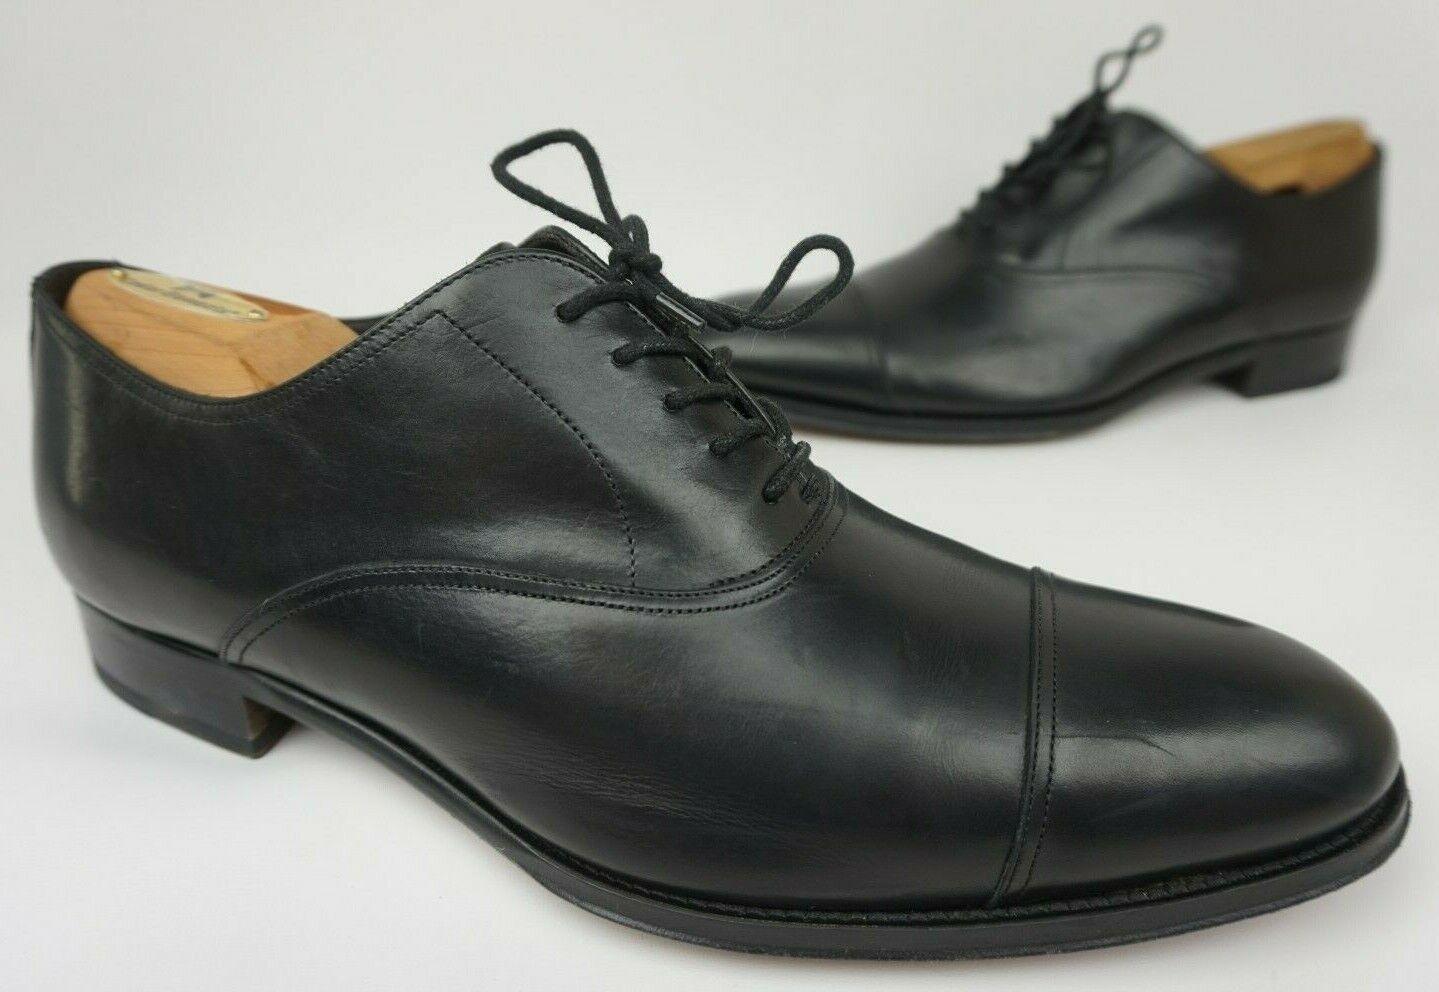 To Stiefel New York Brandon Captoe Oxford Schwarze Lederschuhe Größe 9.5